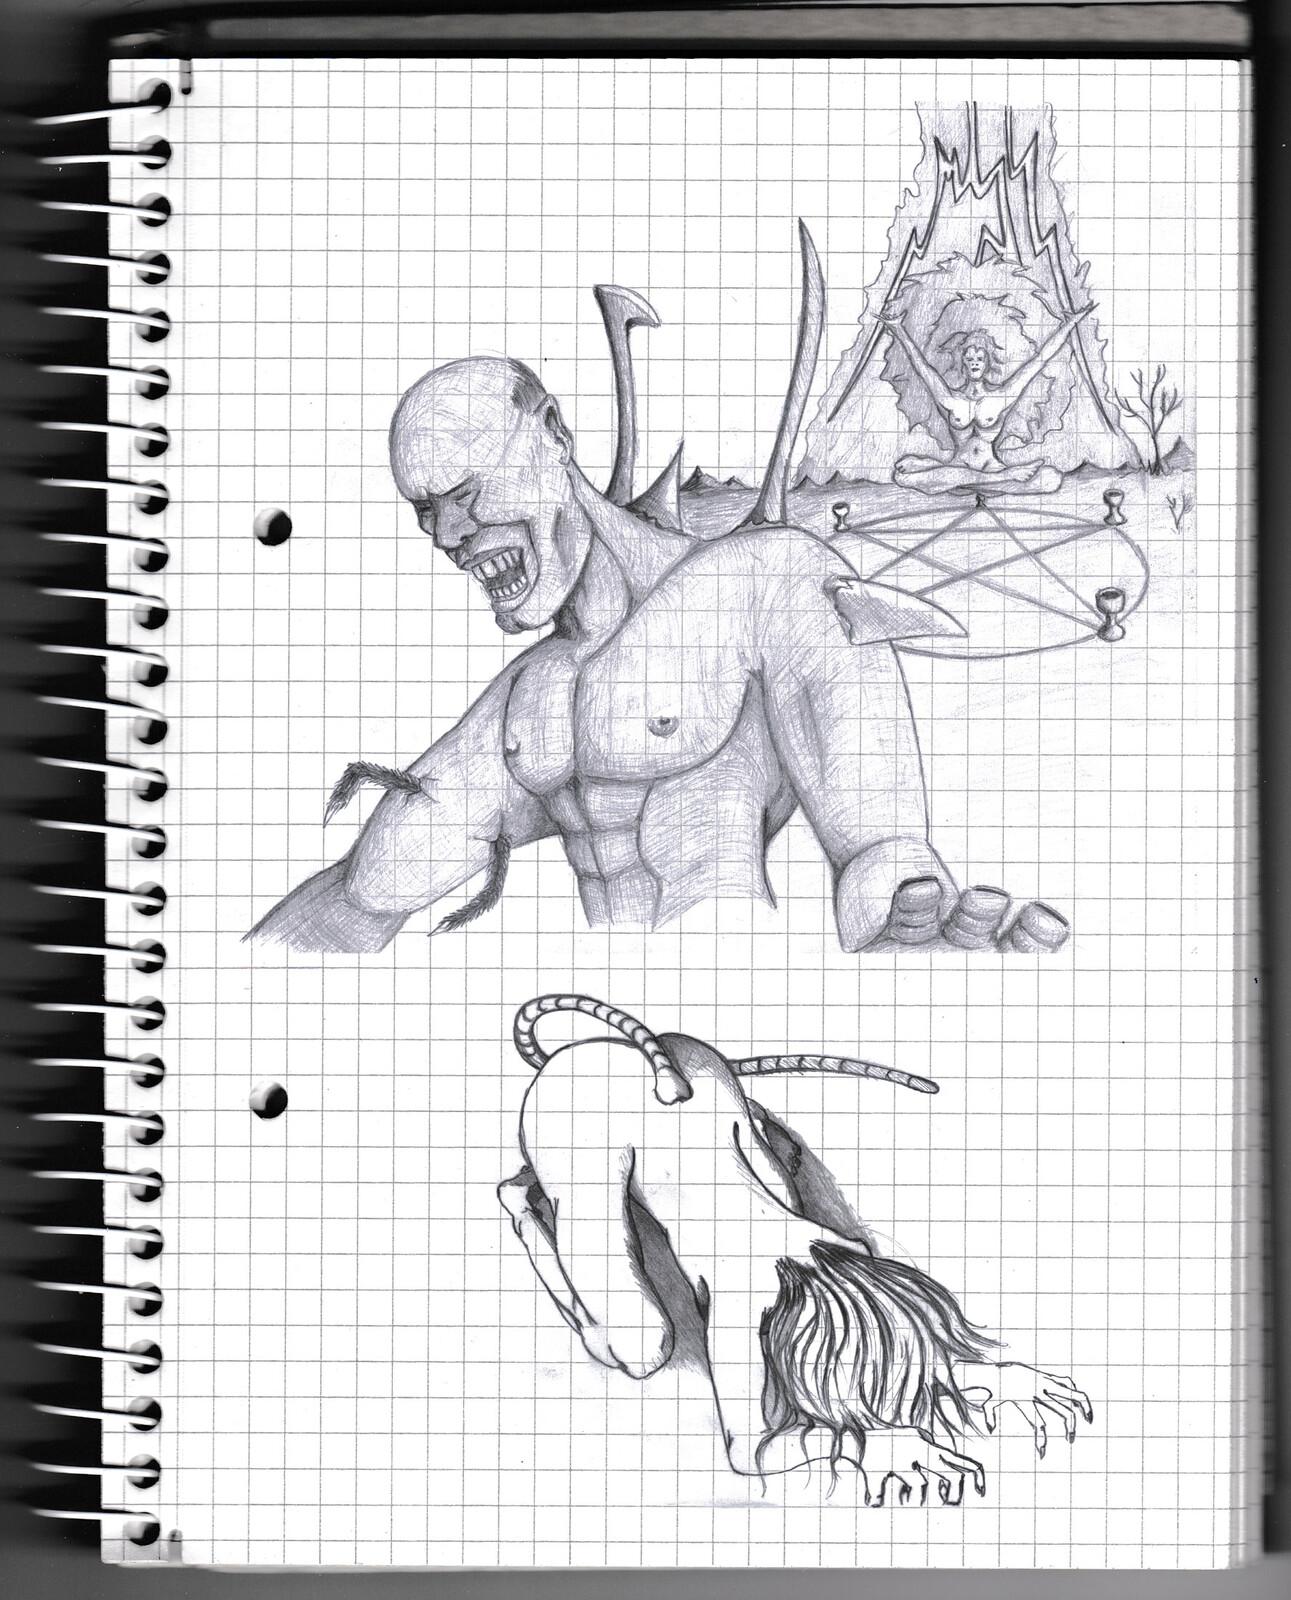 character, sketch, pencil, monster, creature, psychodelic, fantasy, anatomy,